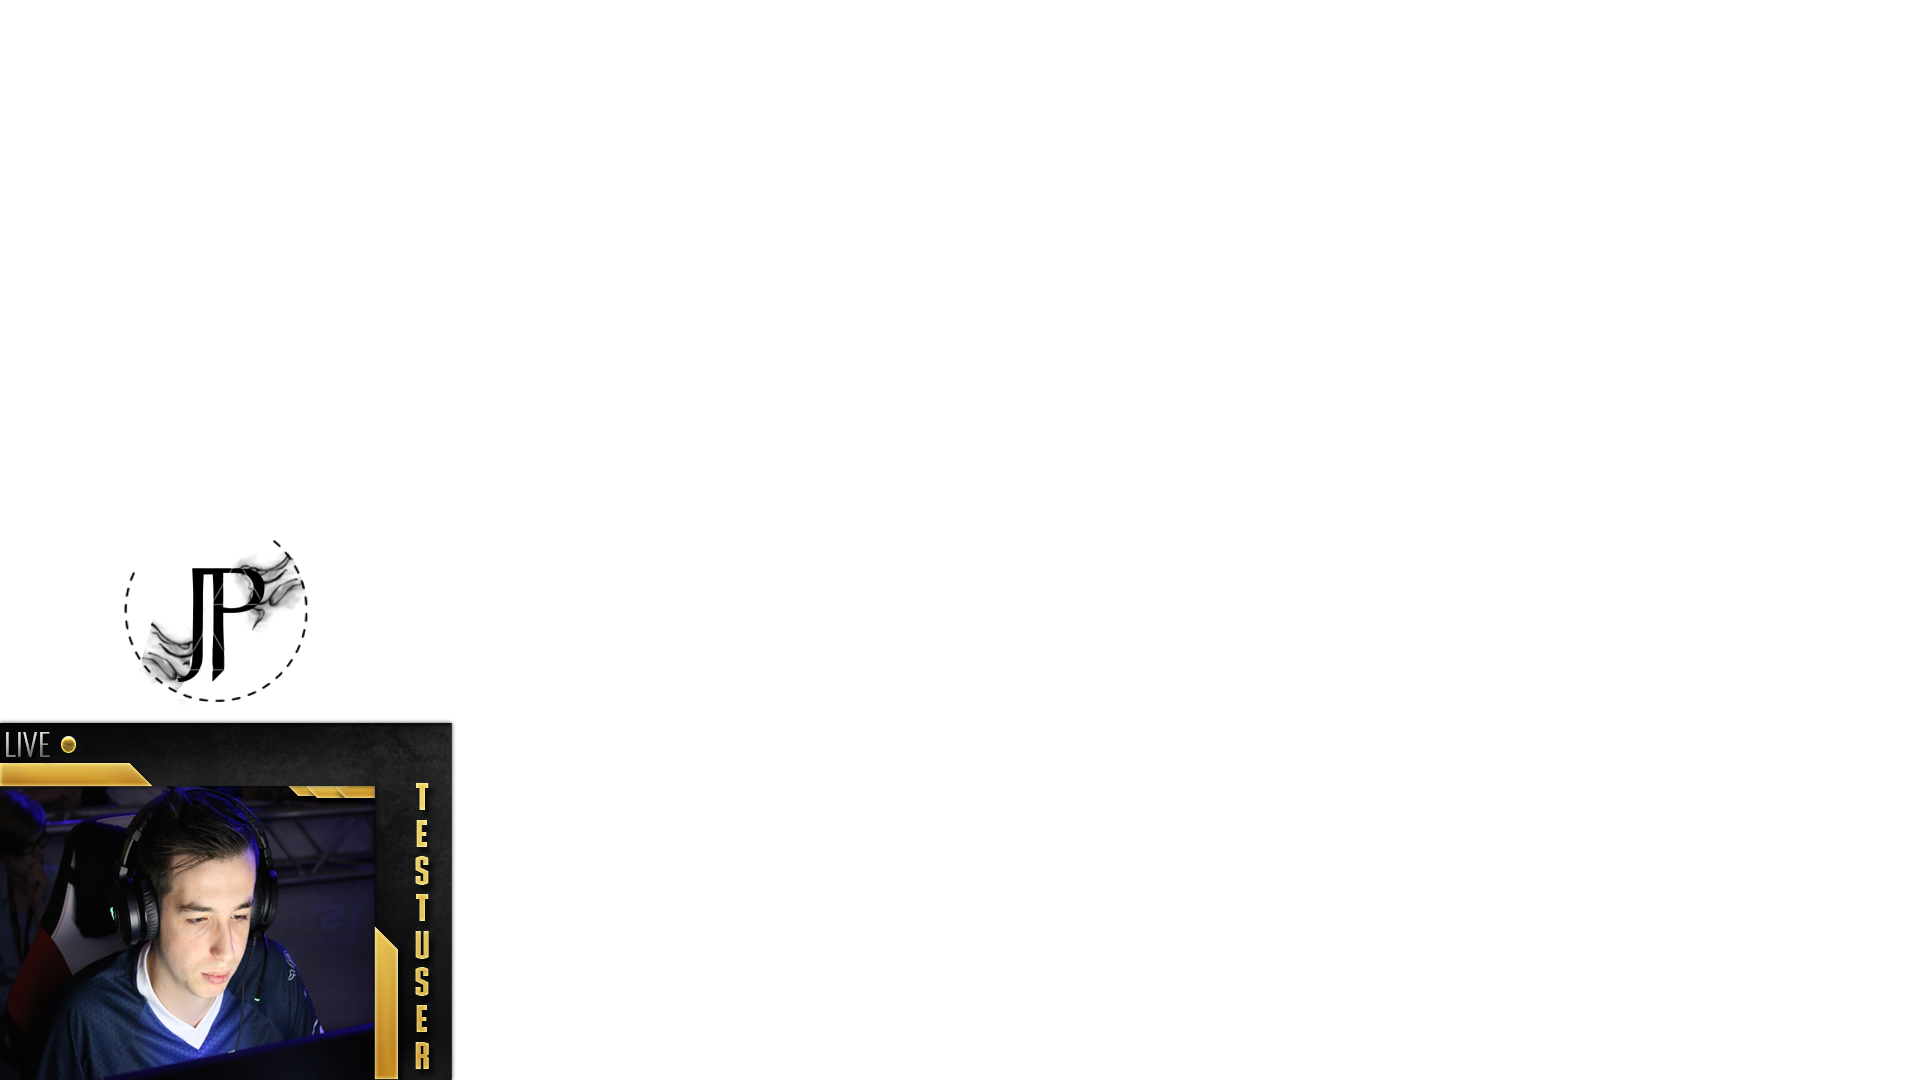 Twitch Facecam Design Live#2 by JaegerPangaia on DeviantArt